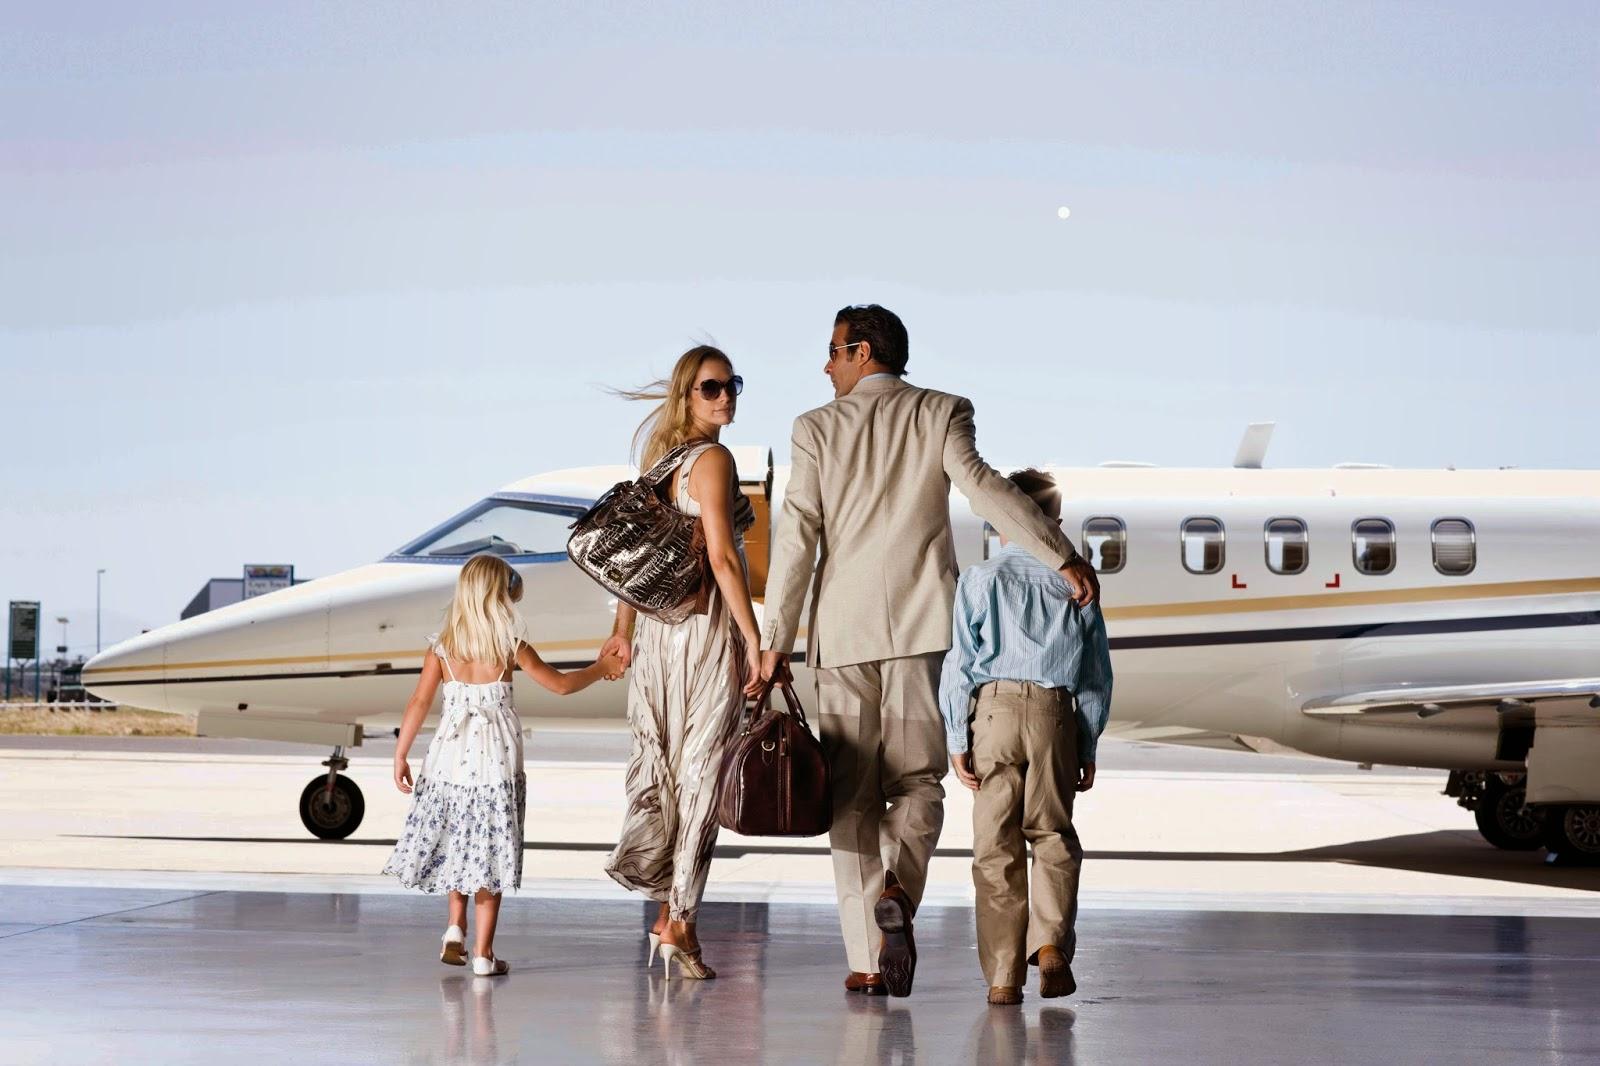 туристы у самолета